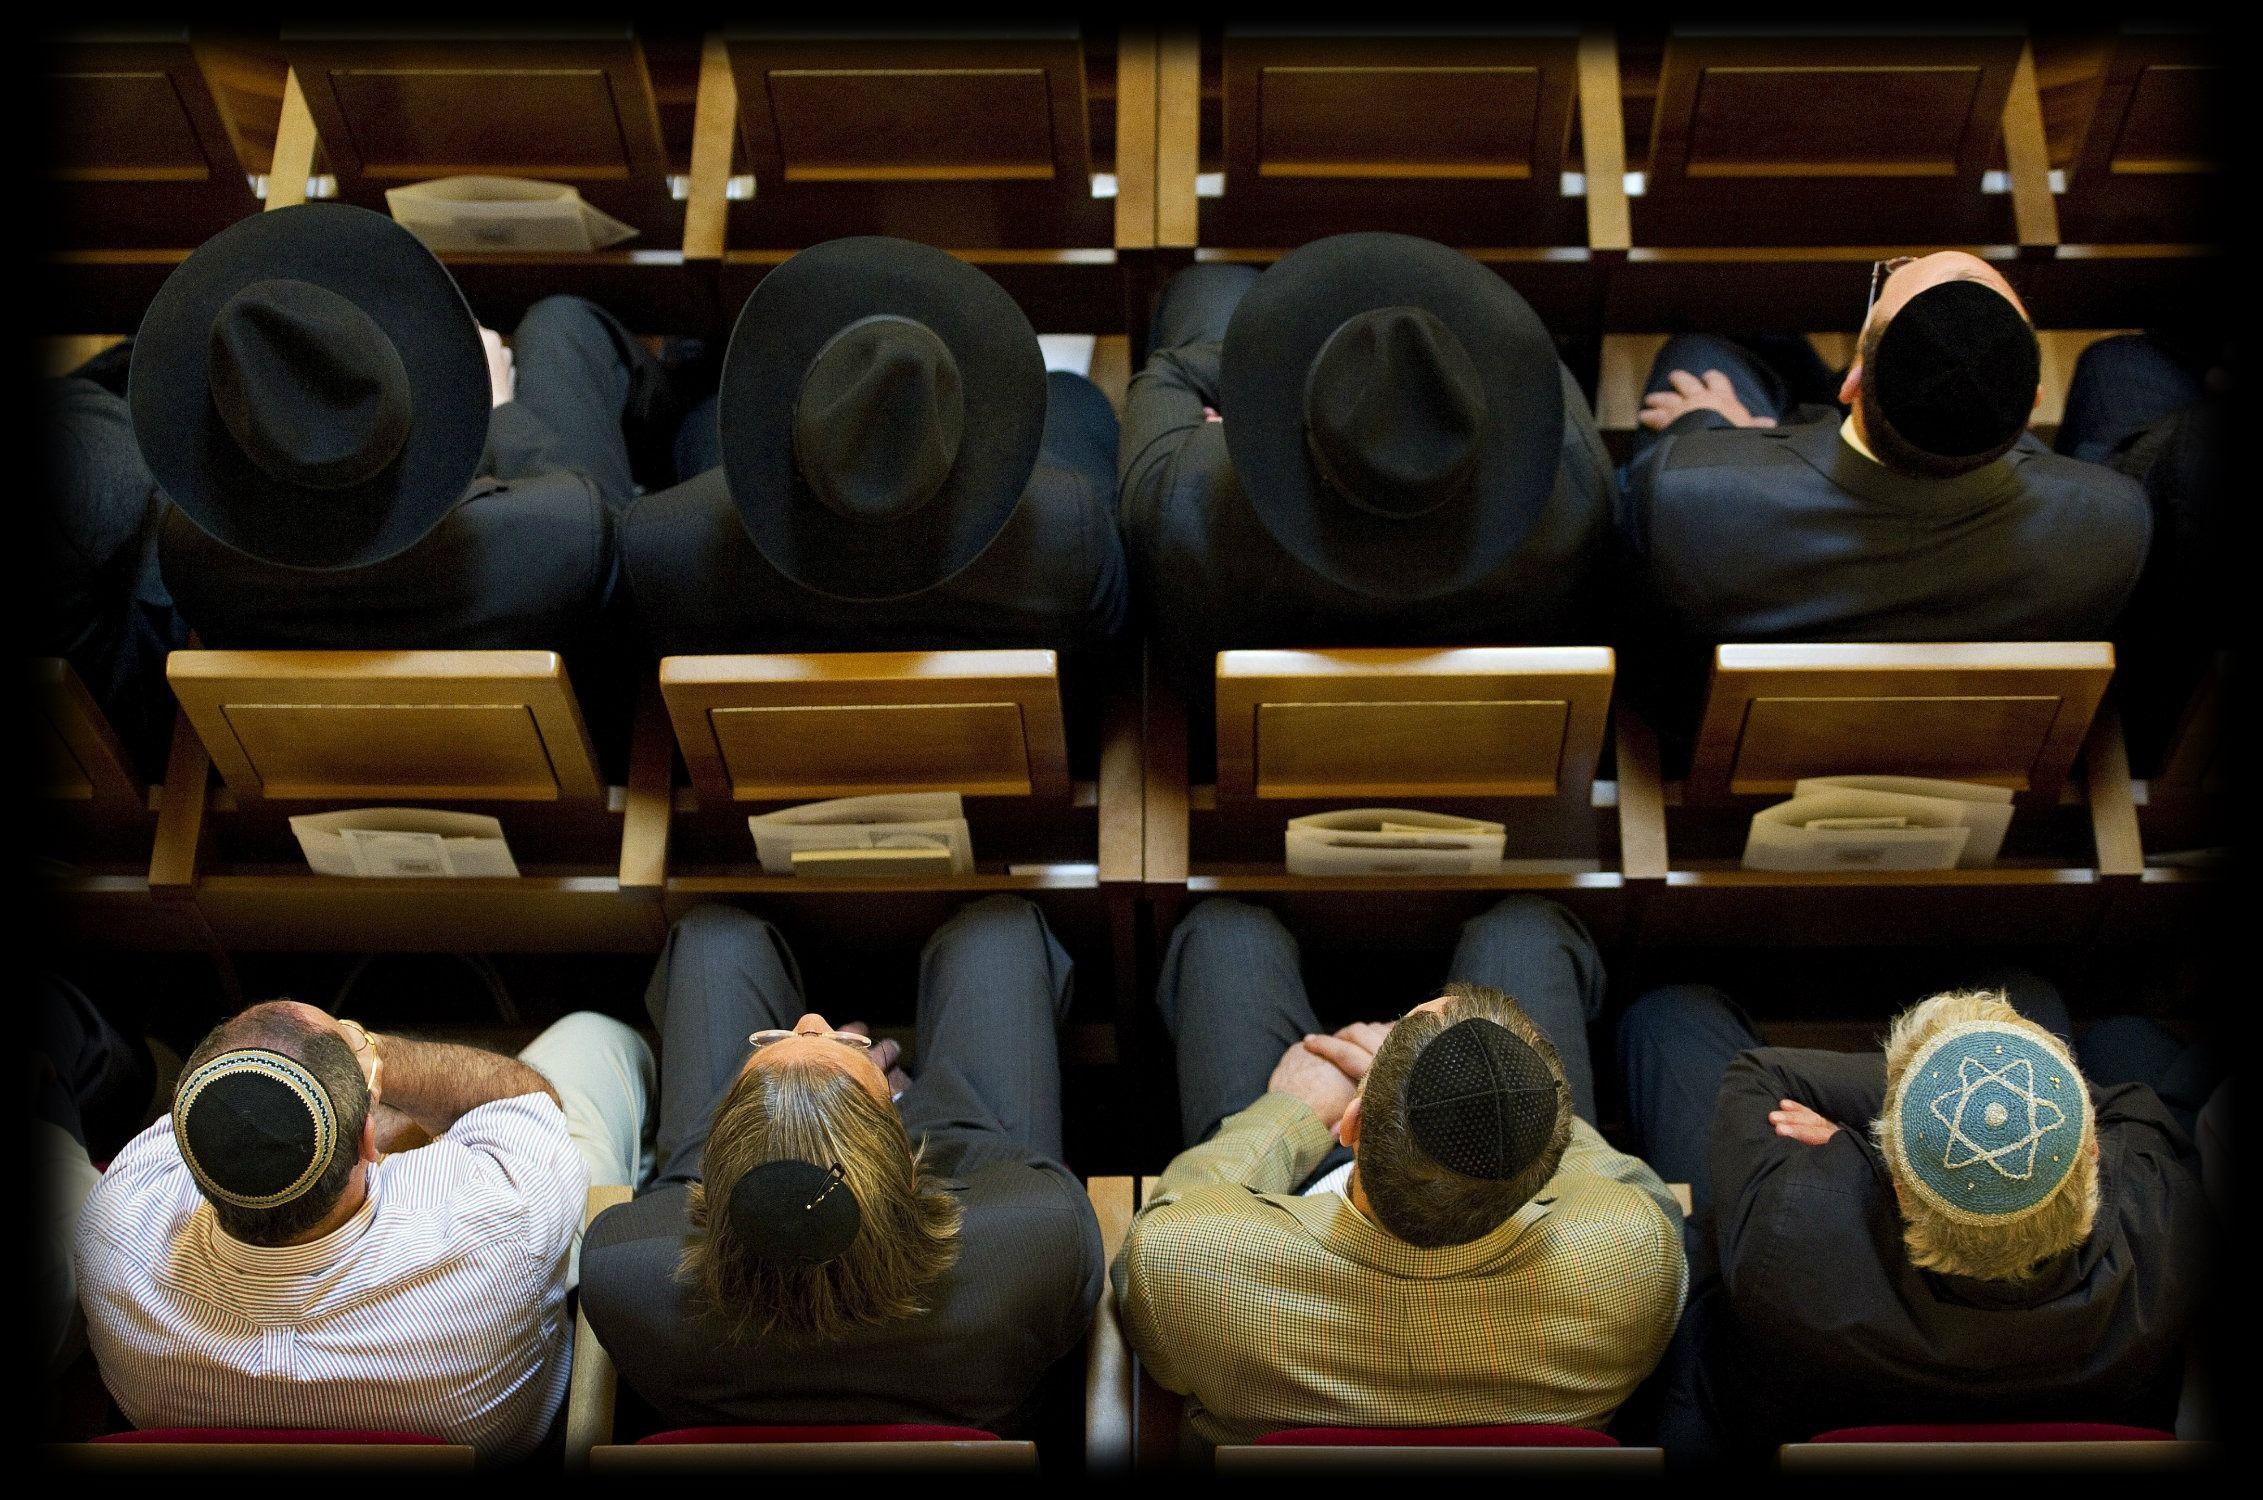 An Unorthodox Secret: How Chabad Fills Pews With Jews